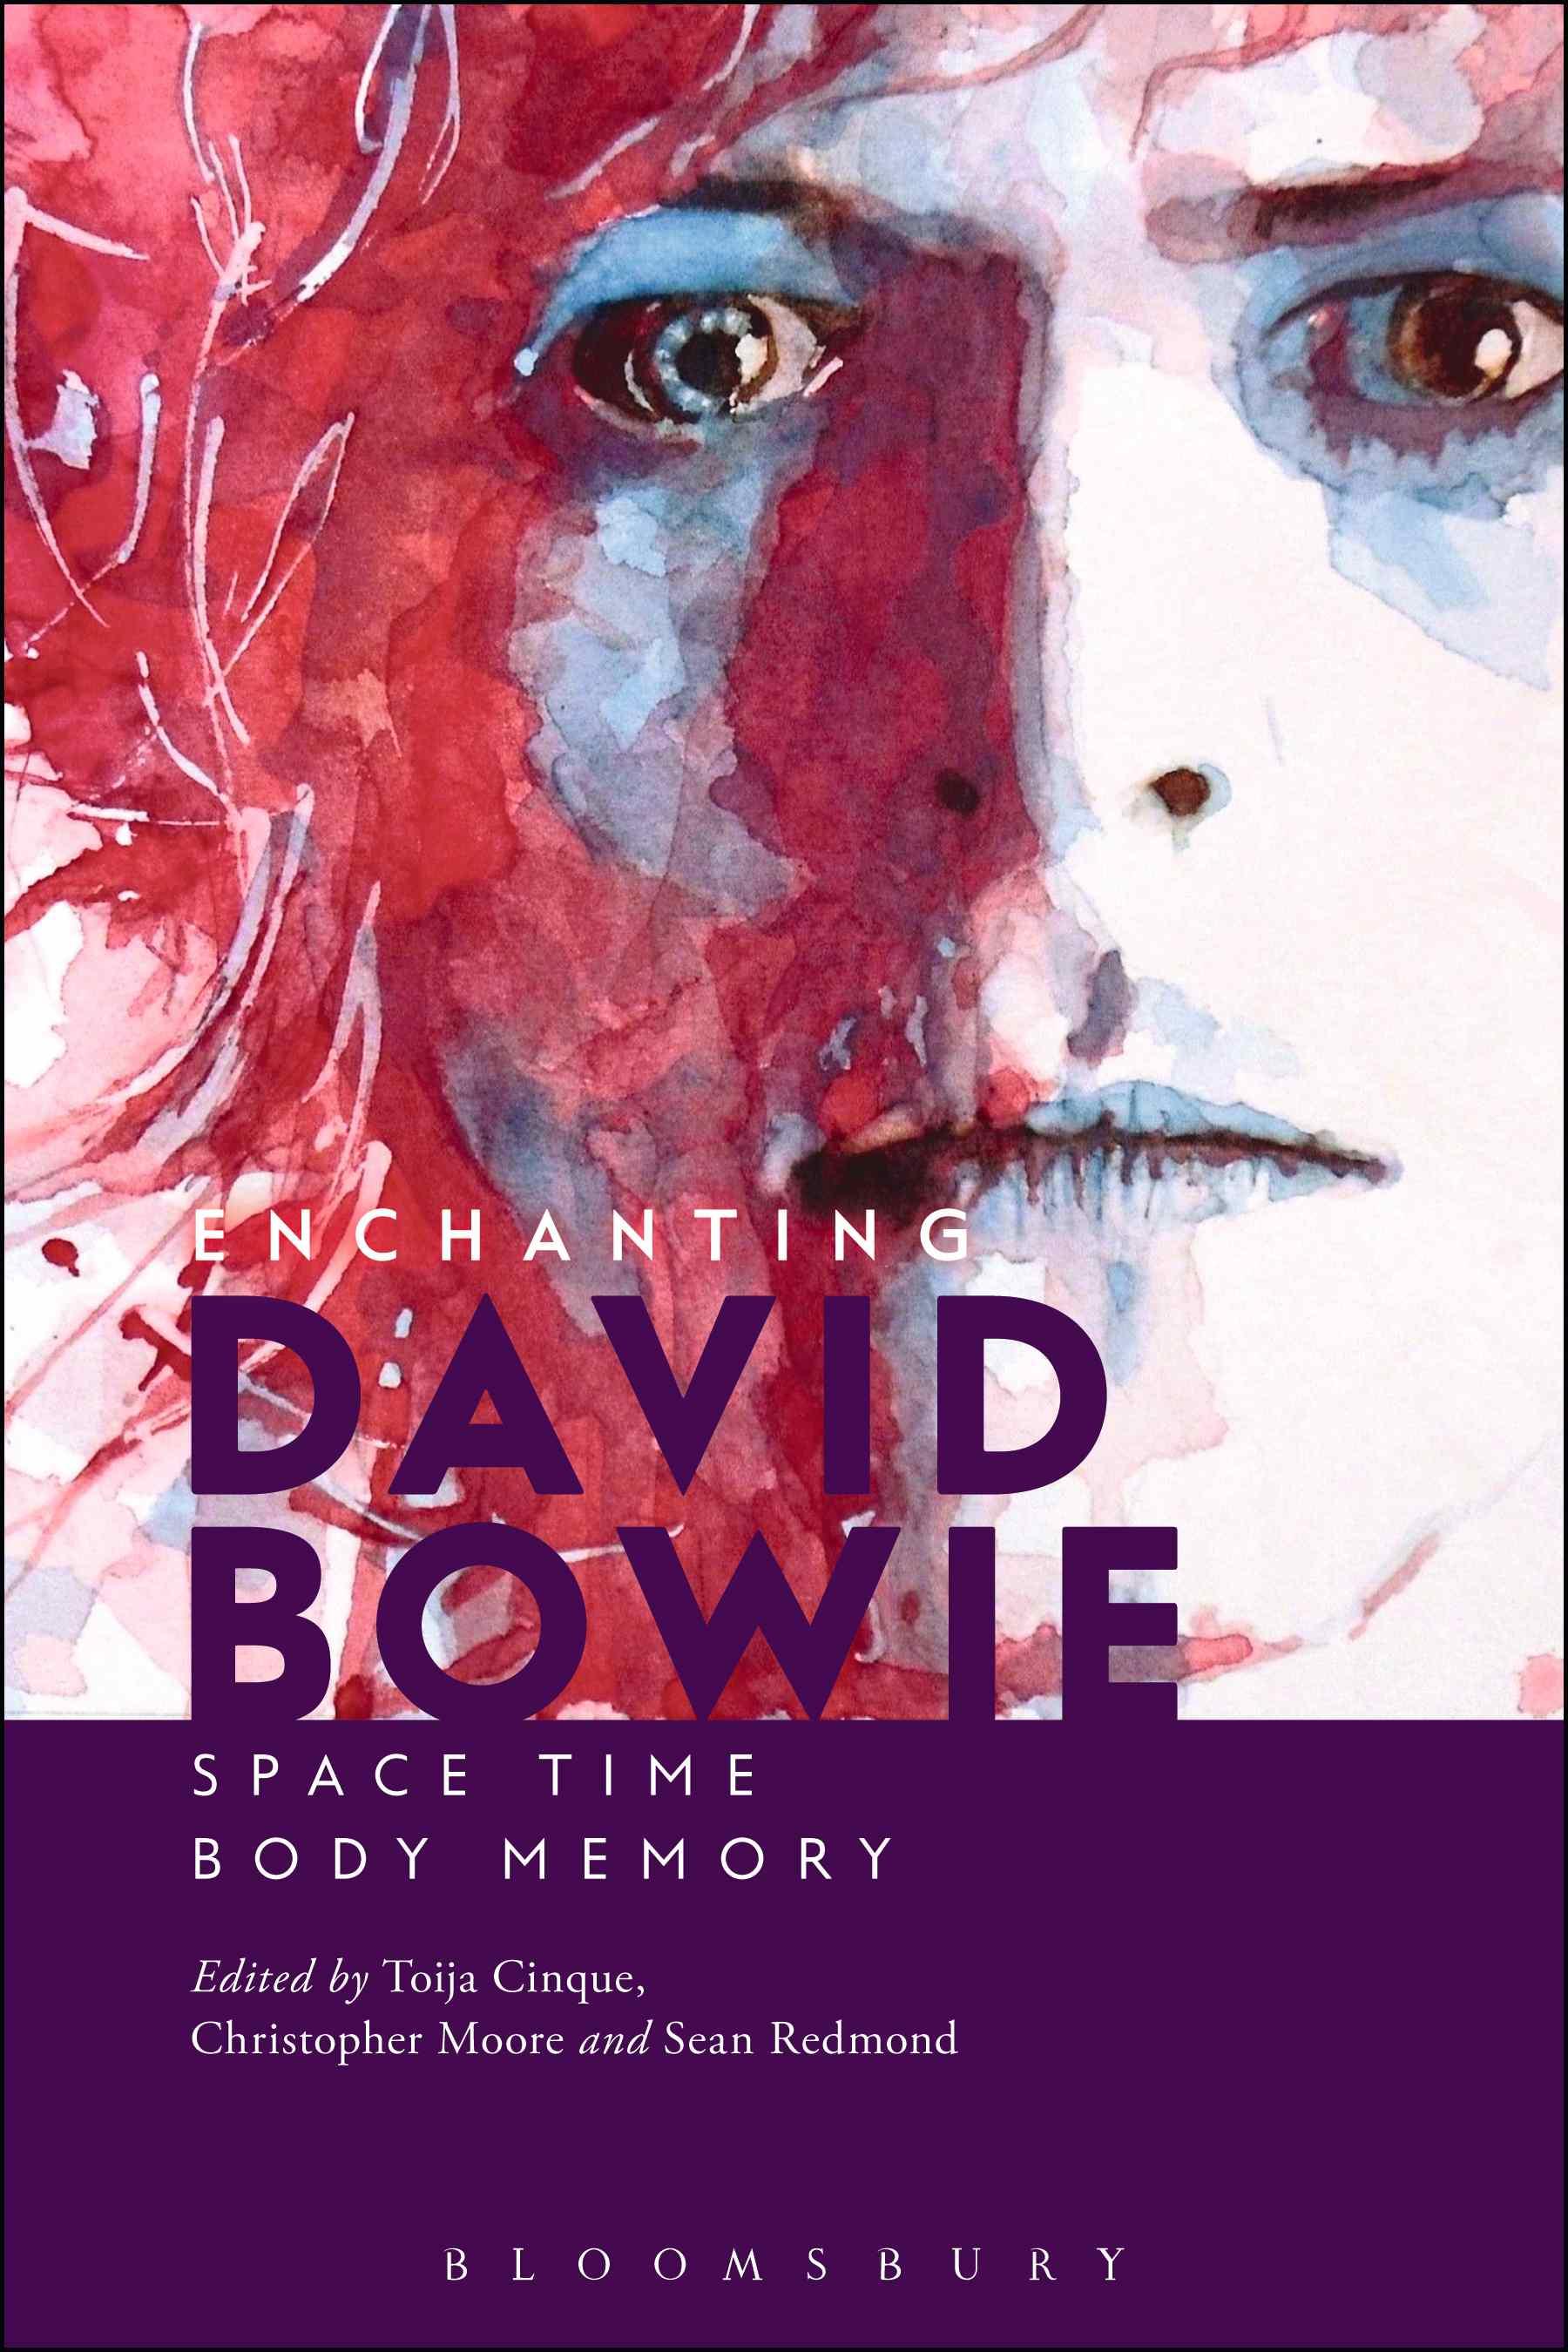 Screen studies books enchanting david bowie fandeluxe Images